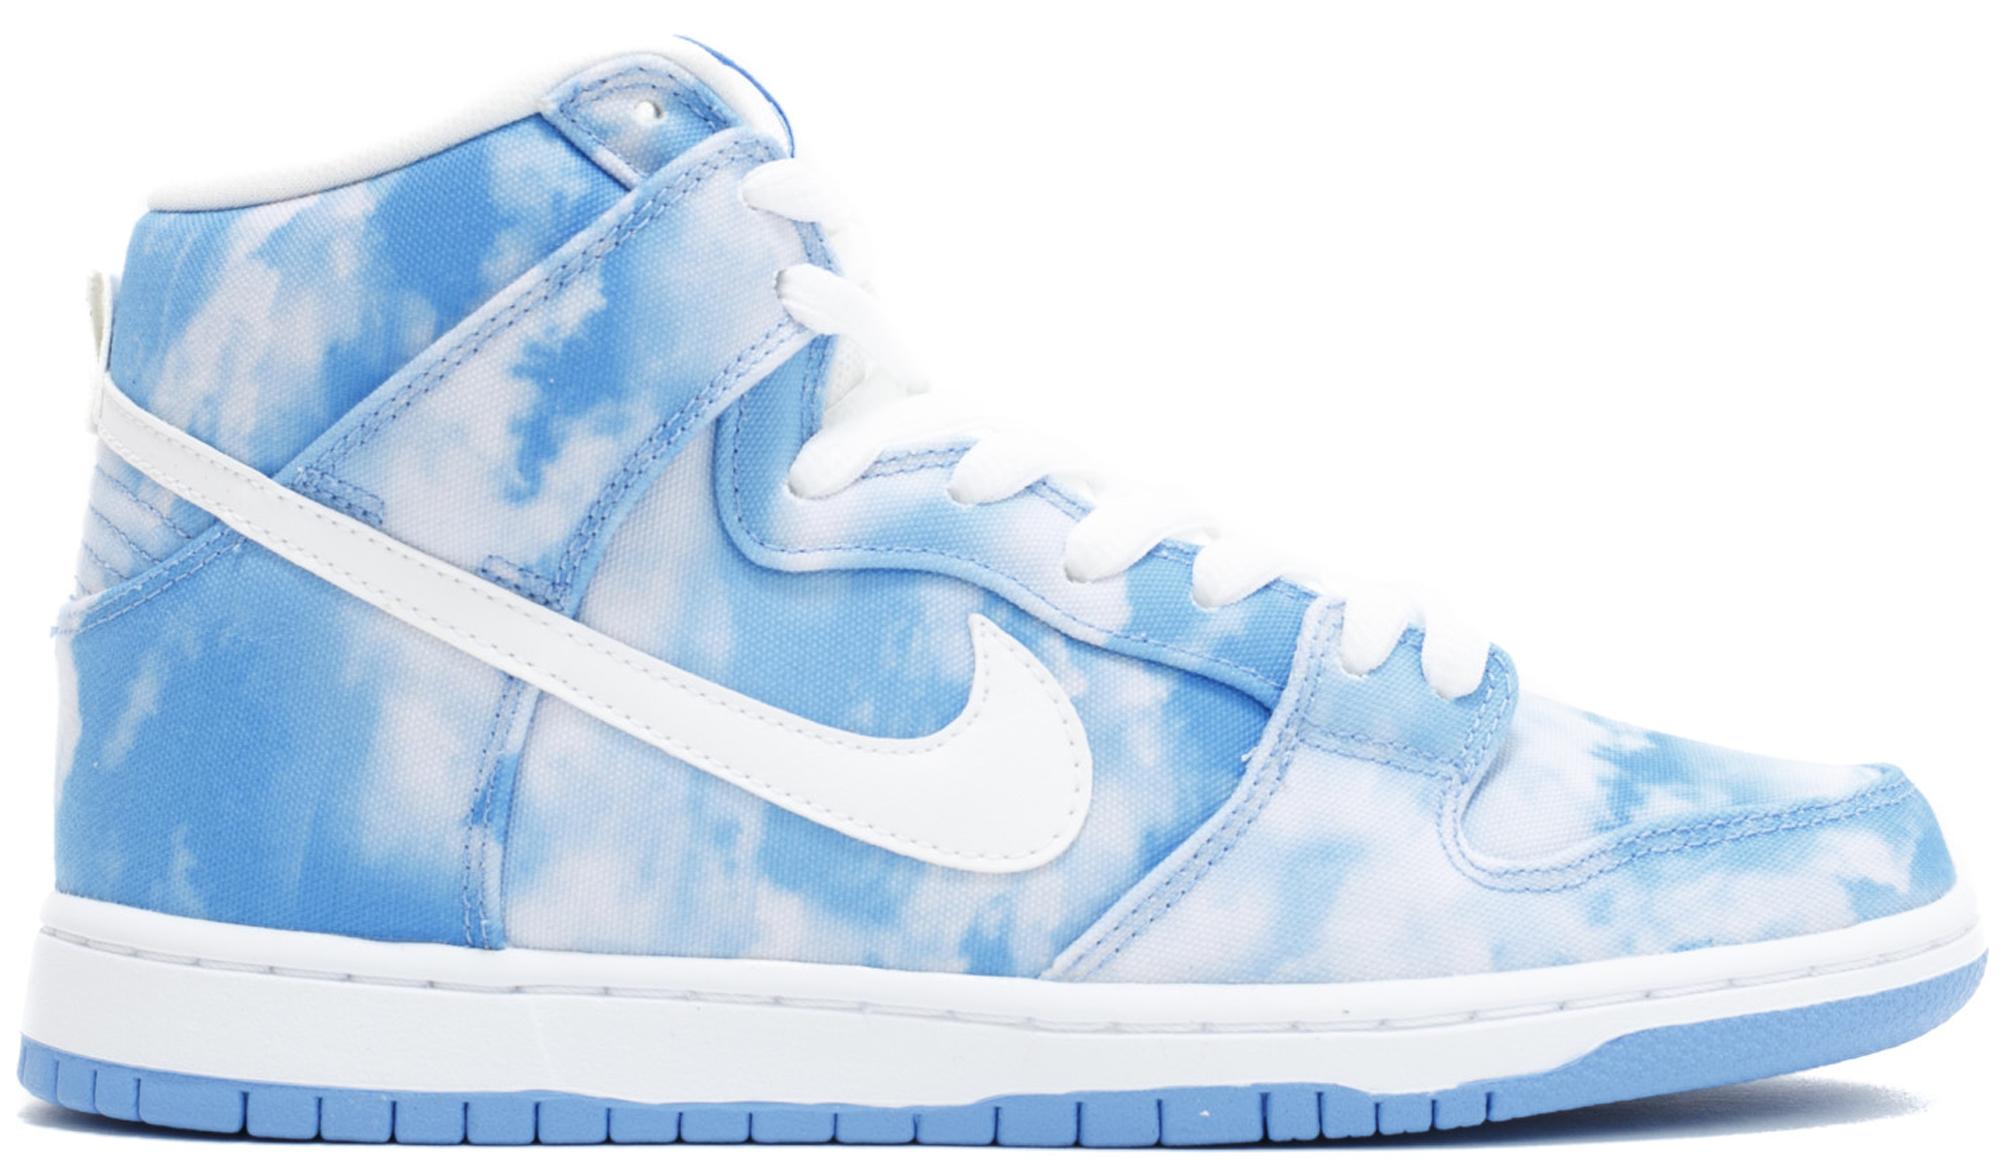 Nike SB Dunk High Clouds - 305050-414